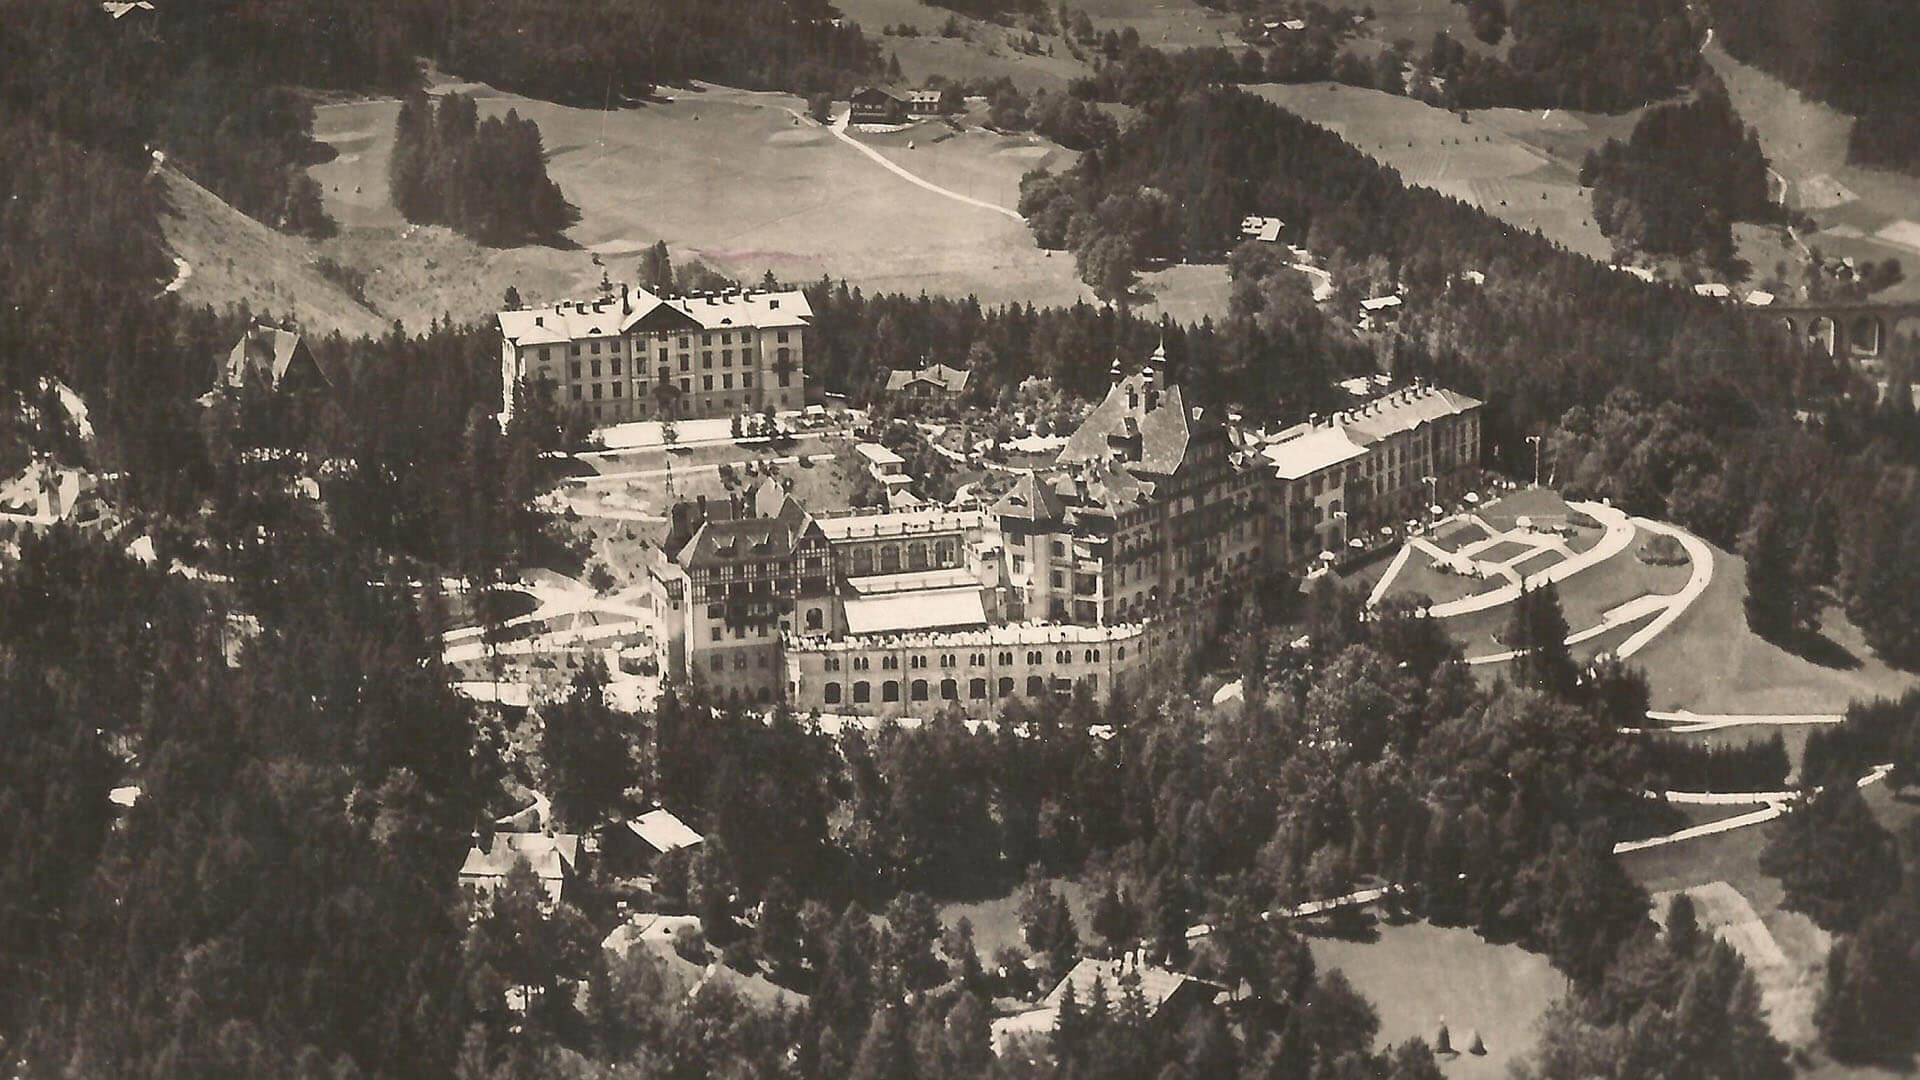 Luftaufnahme anno 1937